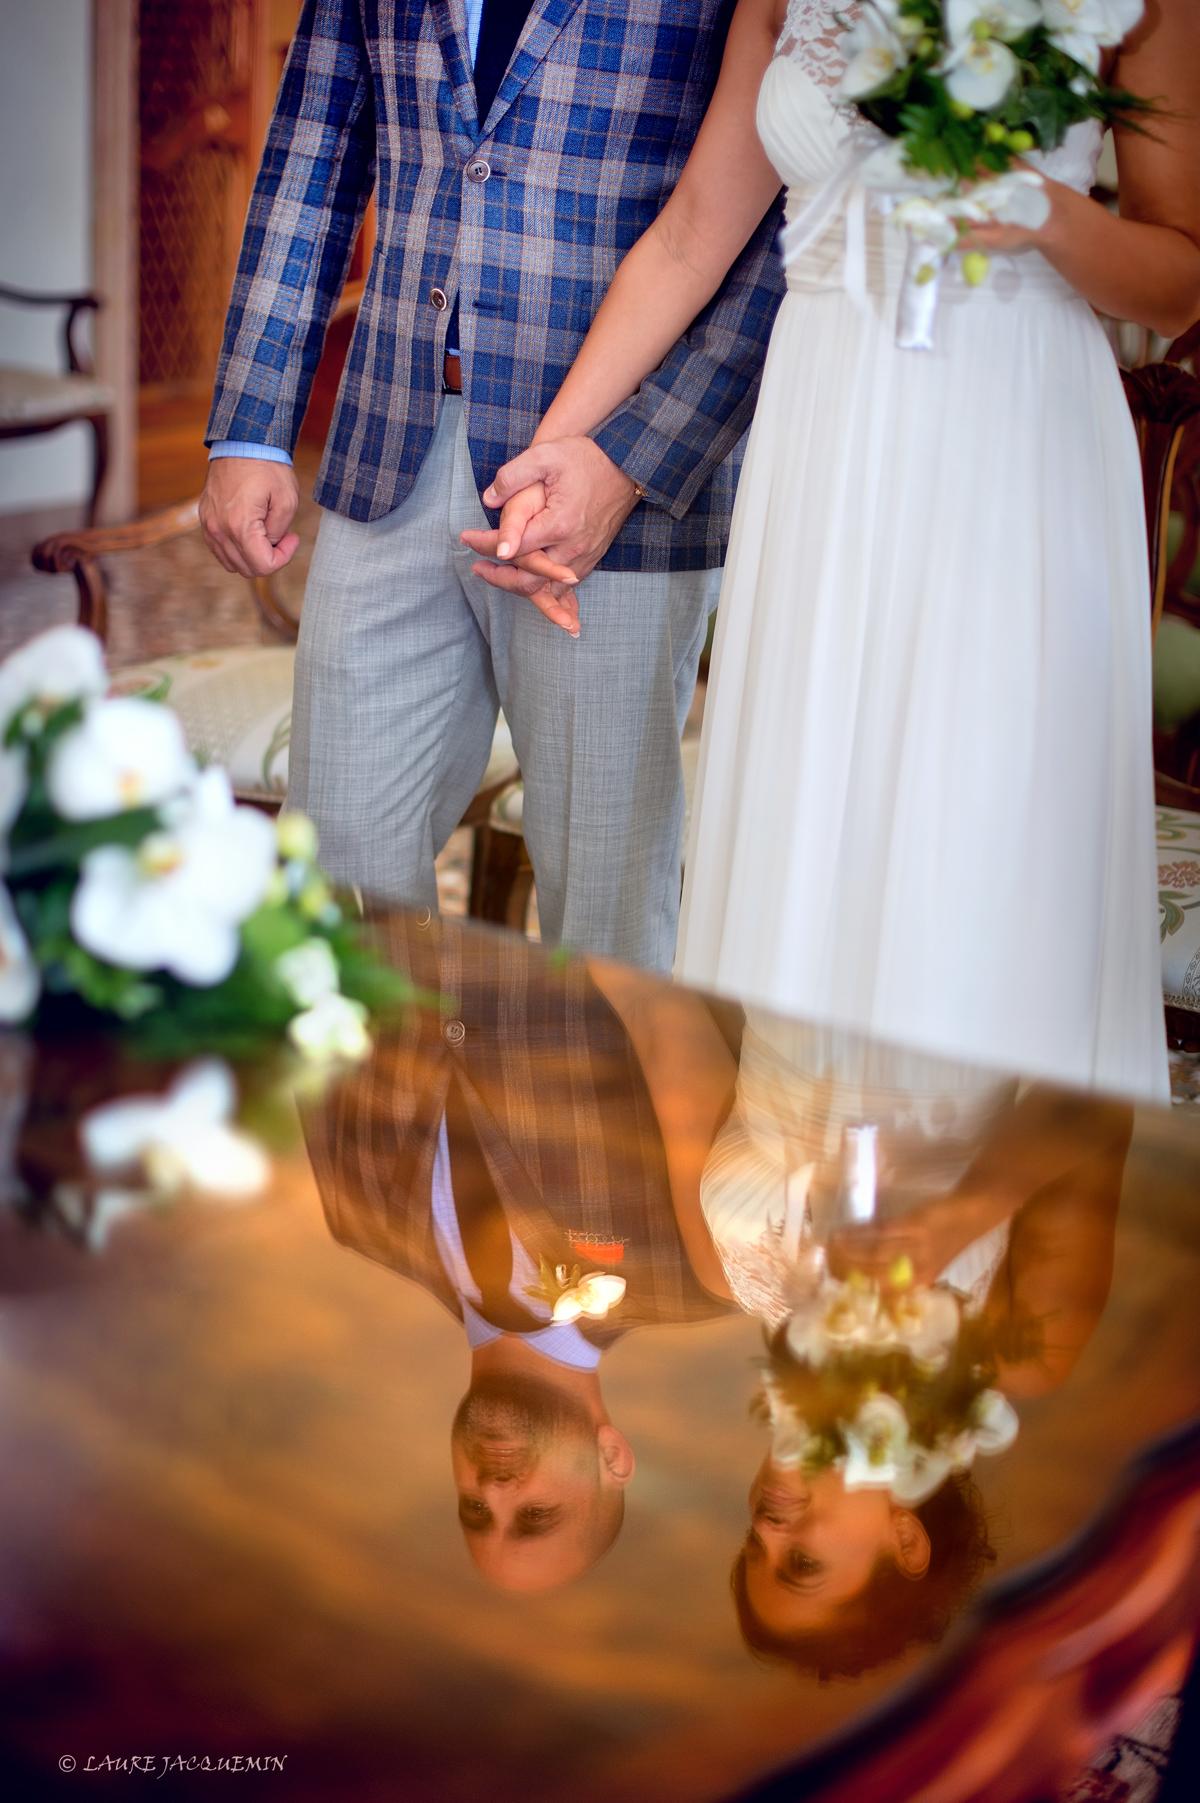 mariage venise photographe palazzo cavalli venice wedding photographer (67).jpg